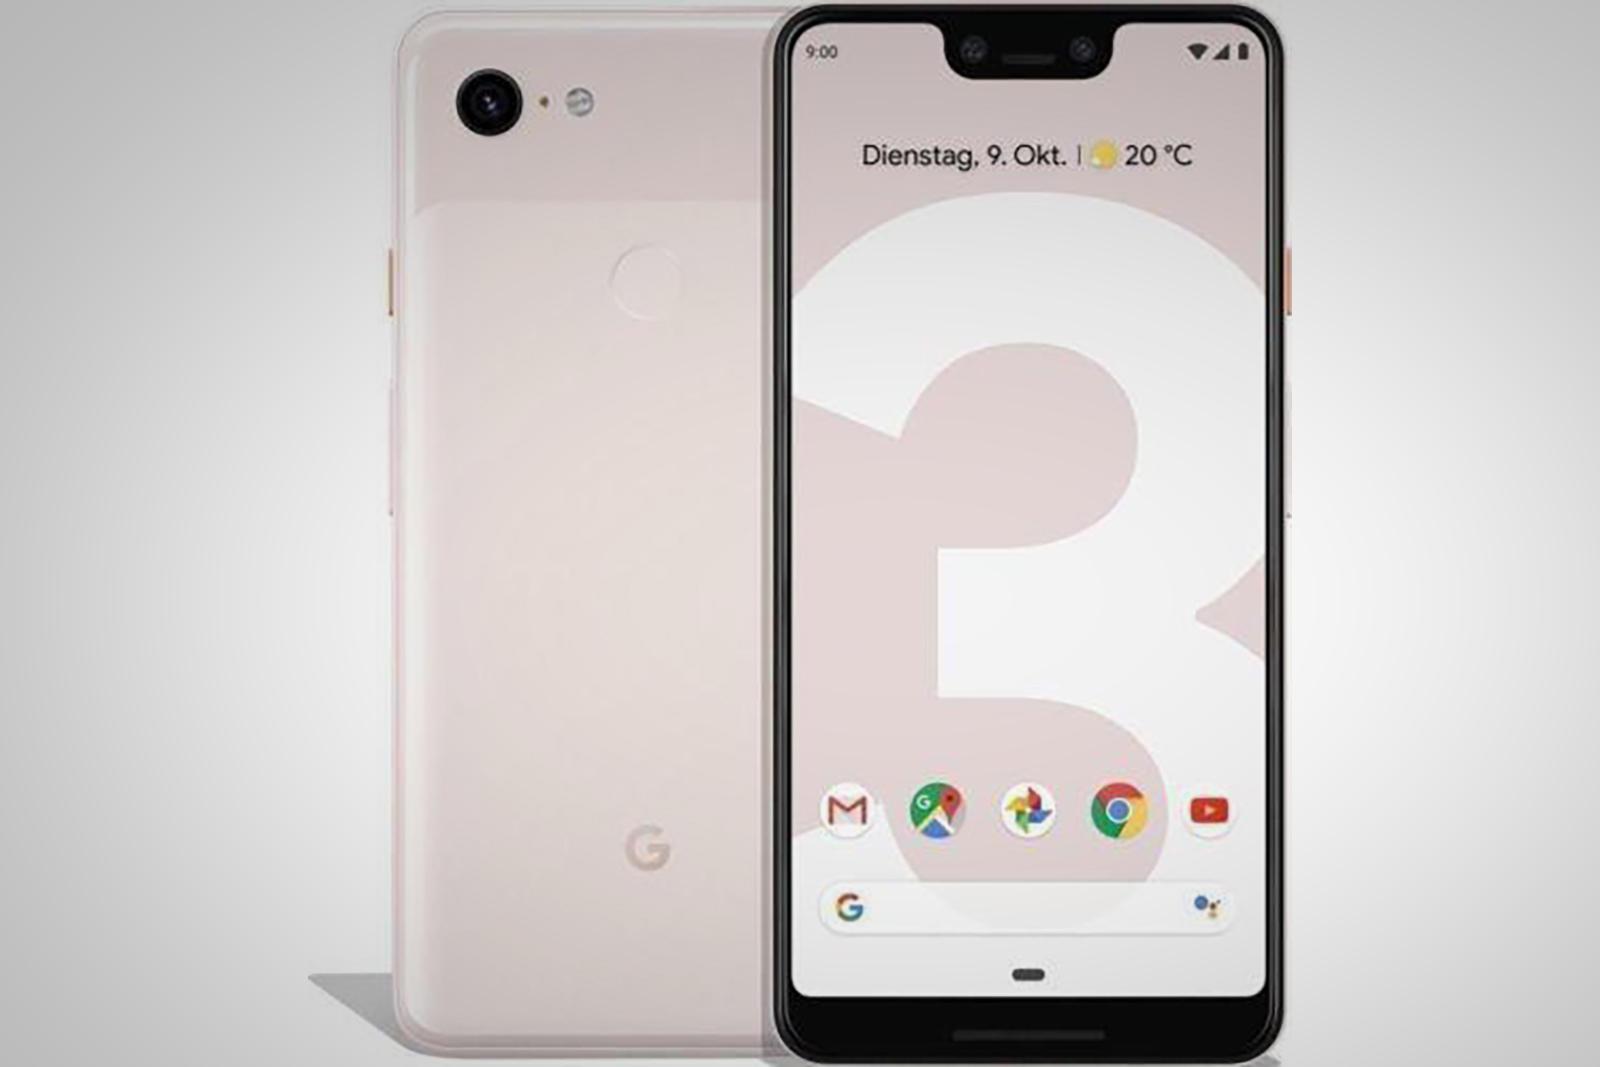 Google Pixel Telefon tolles 3a XL